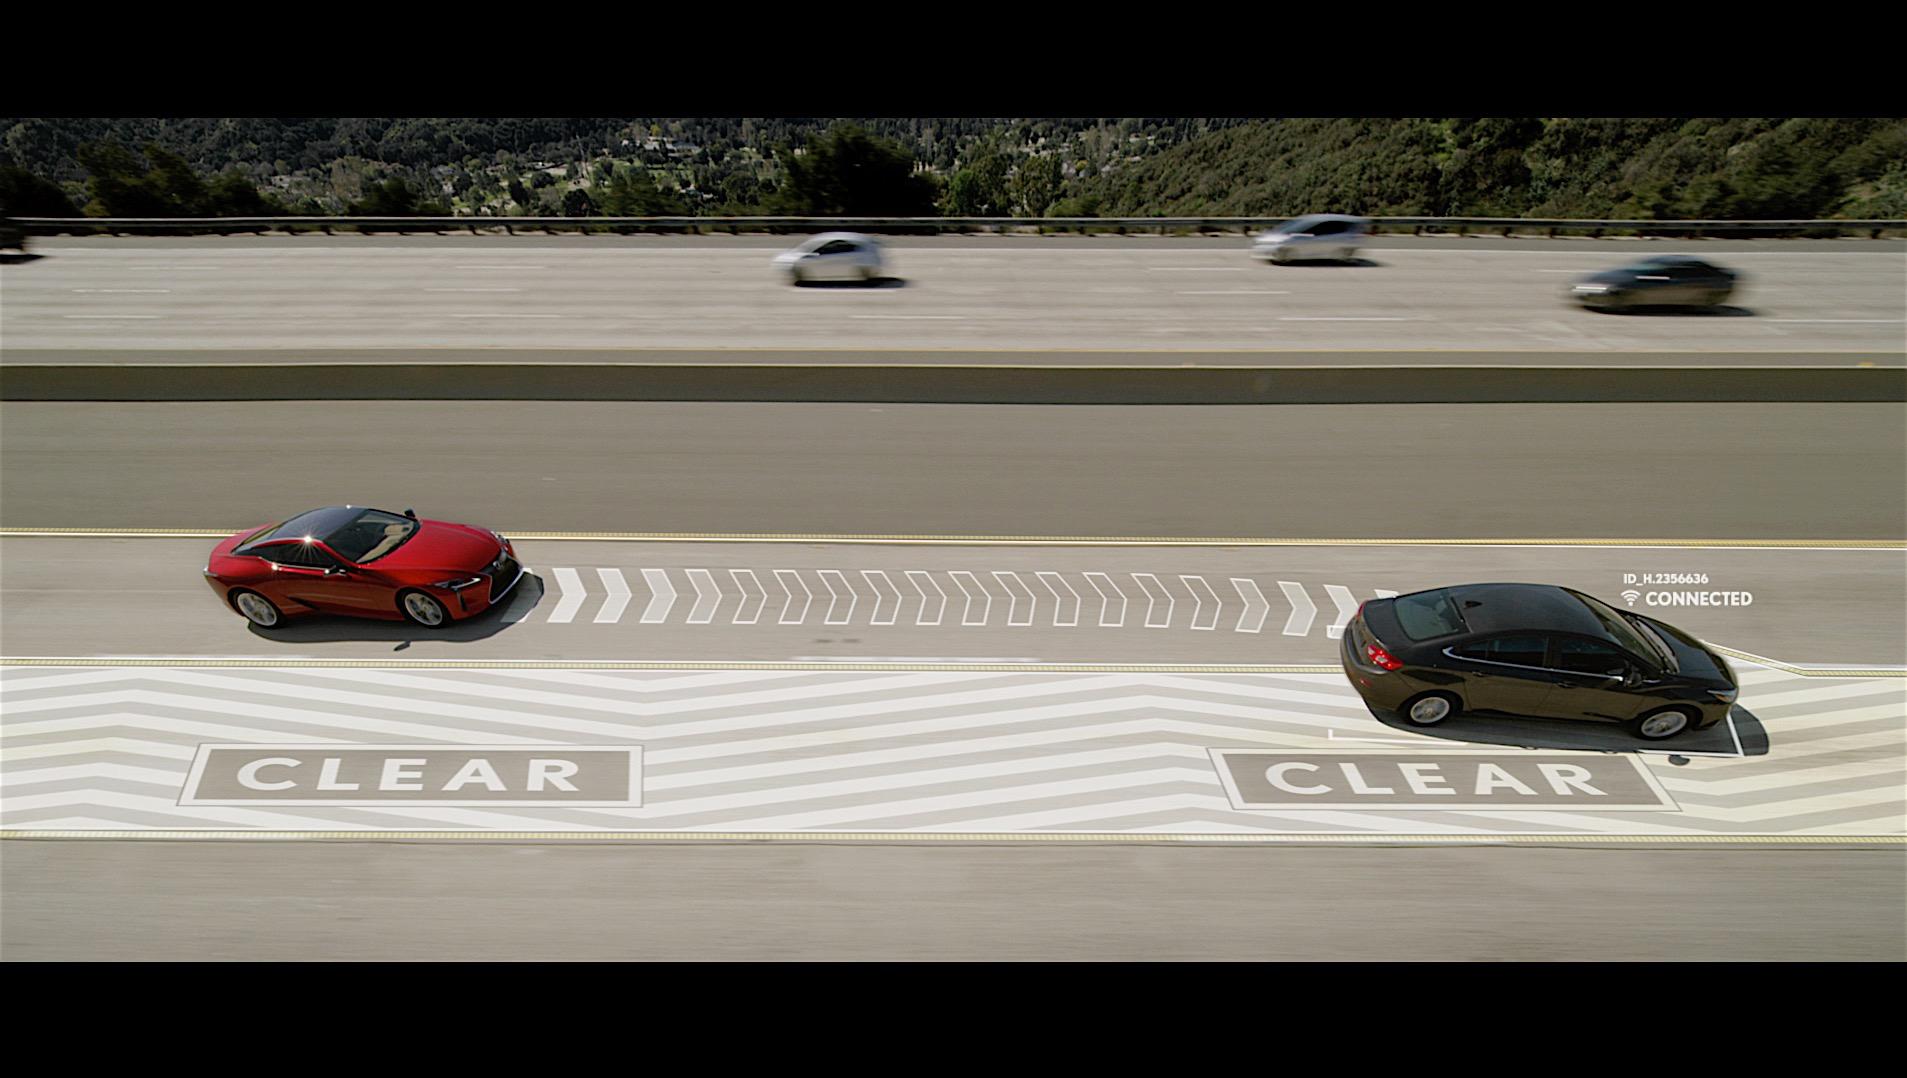 Lexus April Fools' Day prank uses V2V against left-lane hogs